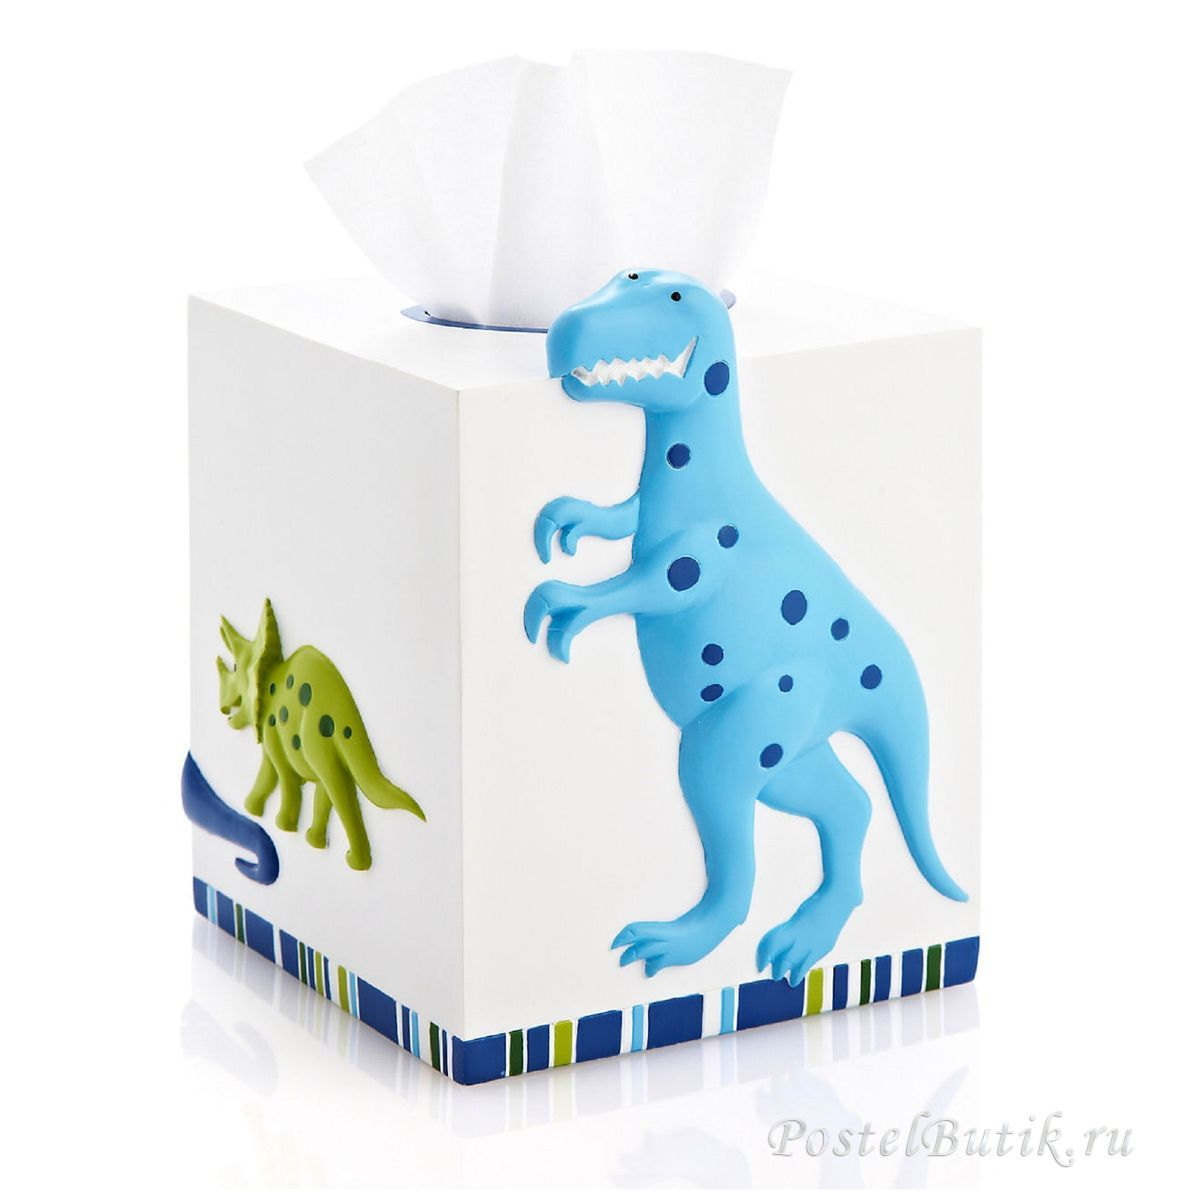 Салфетницы Салфетница детская Kassatex Dino Park salfetnitsa-dino-park-ot-kassatex-ssha-kitay.jpg